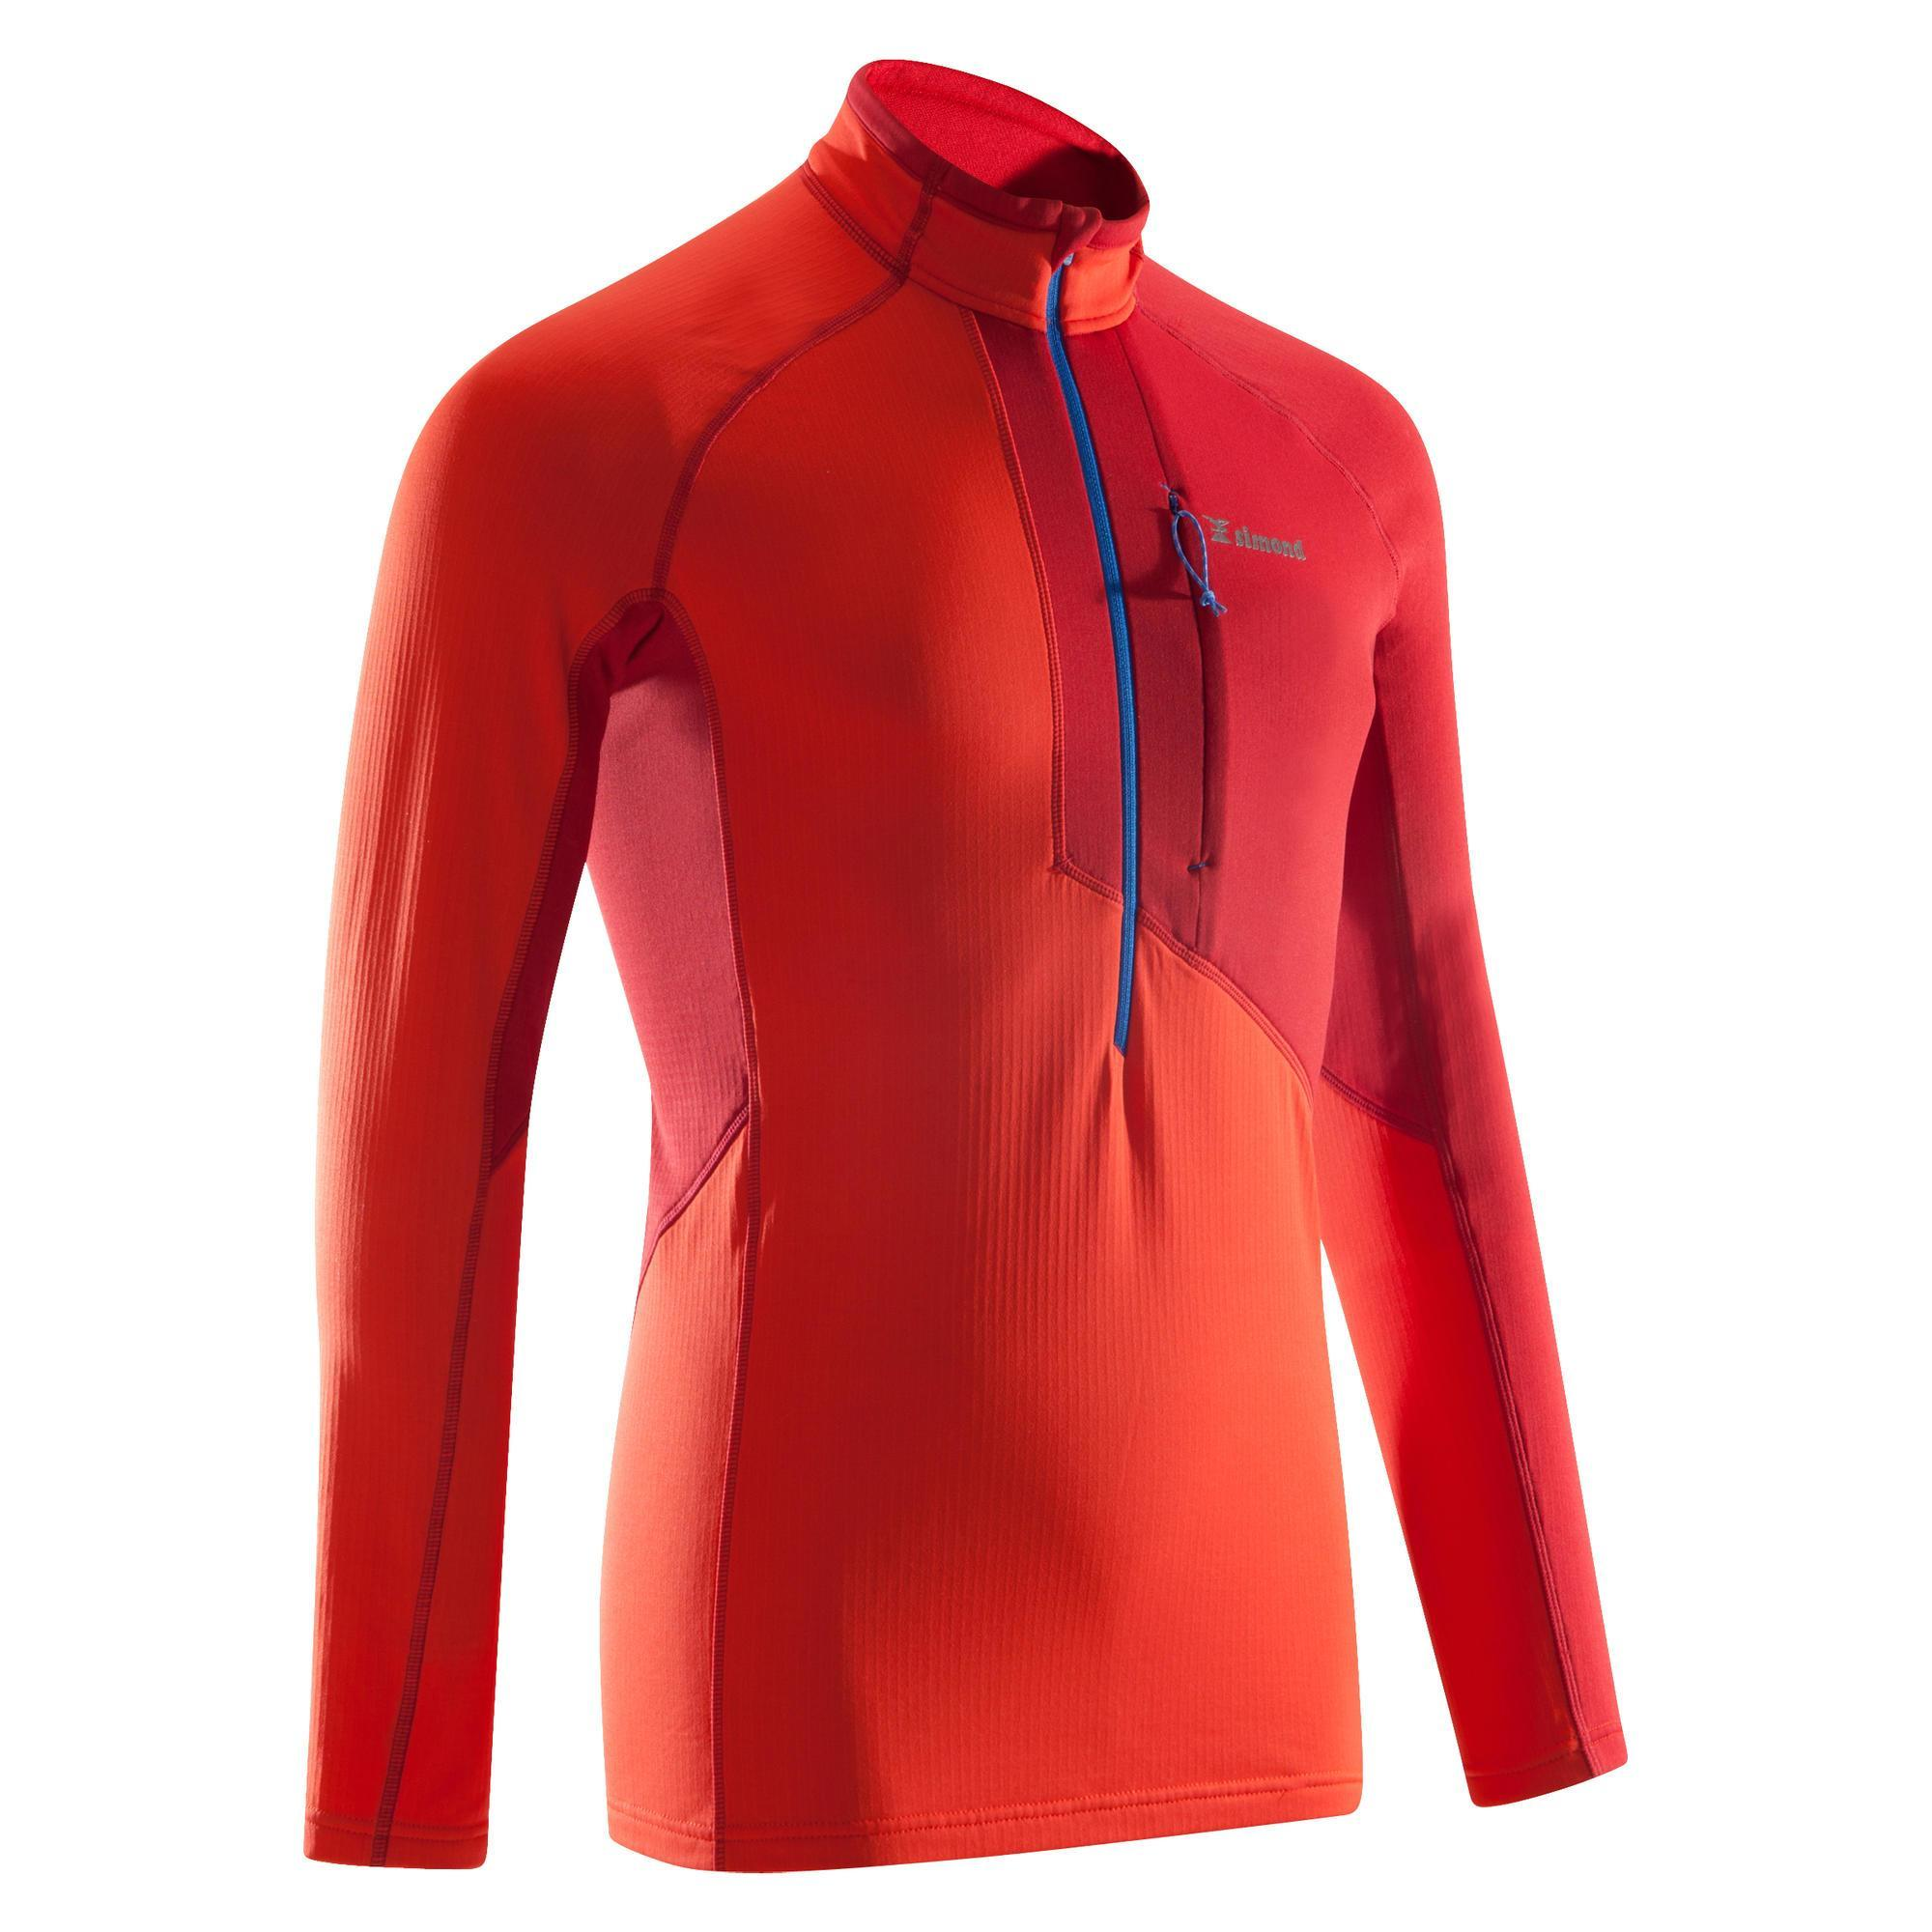 Klettershirt Sweat Alpinism 1/2 Zip Herren rot/zinnoberrot | Sportbekleidung > Sportshirts > Klettershirts | Rot - Orange - Bordeaux | Simond